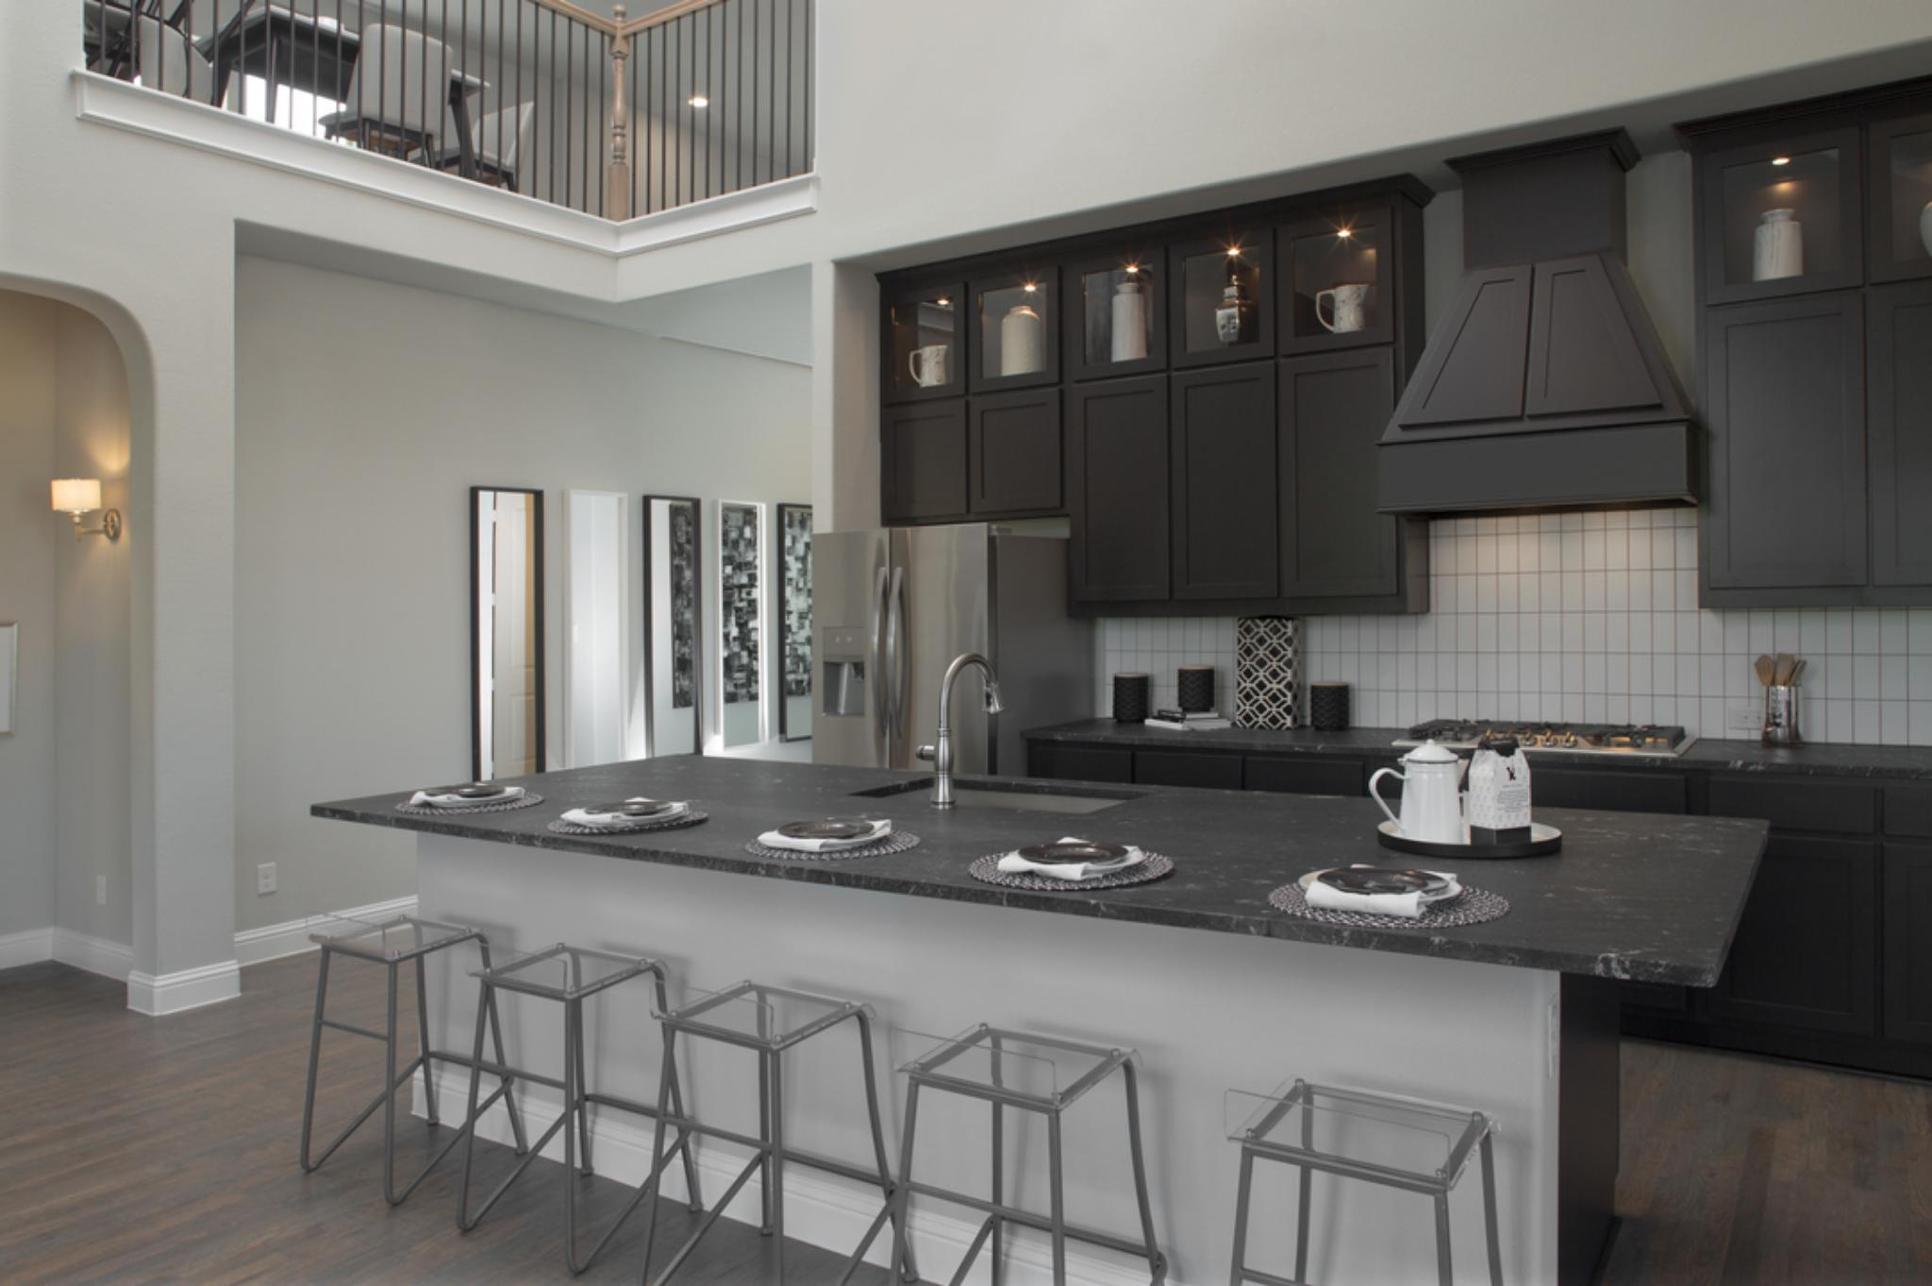 GRZ IMPORT IMAGE:Glen View | Kinsley Model | Foyer & Kitchen